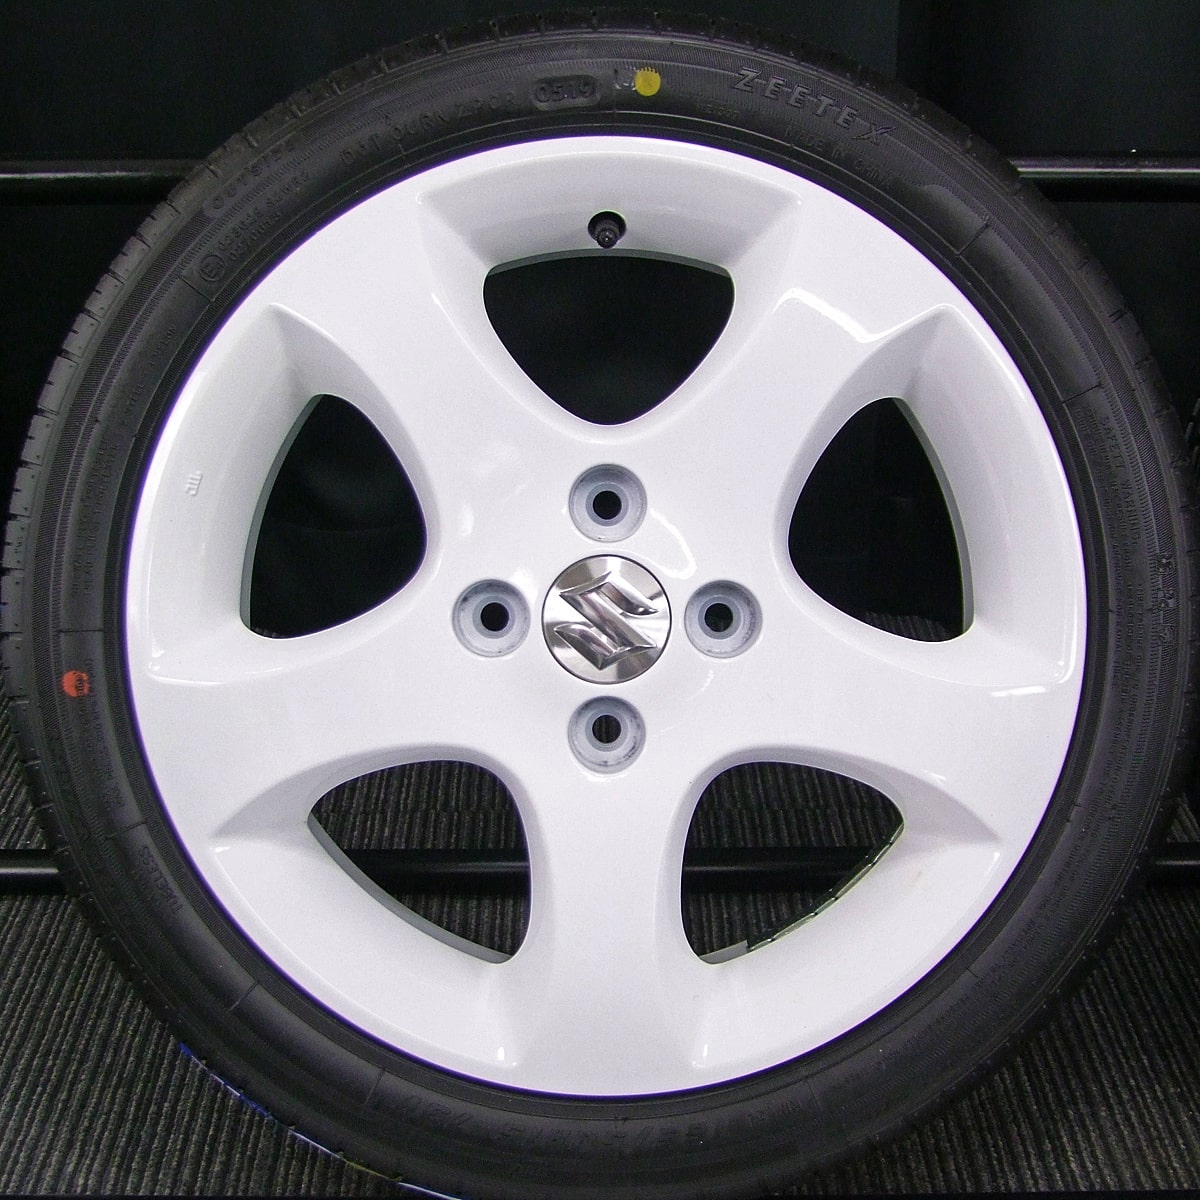 SUZUKI スイフト 純正 ホワイト ZEETEX ZT1000 165/50R15 4本SET